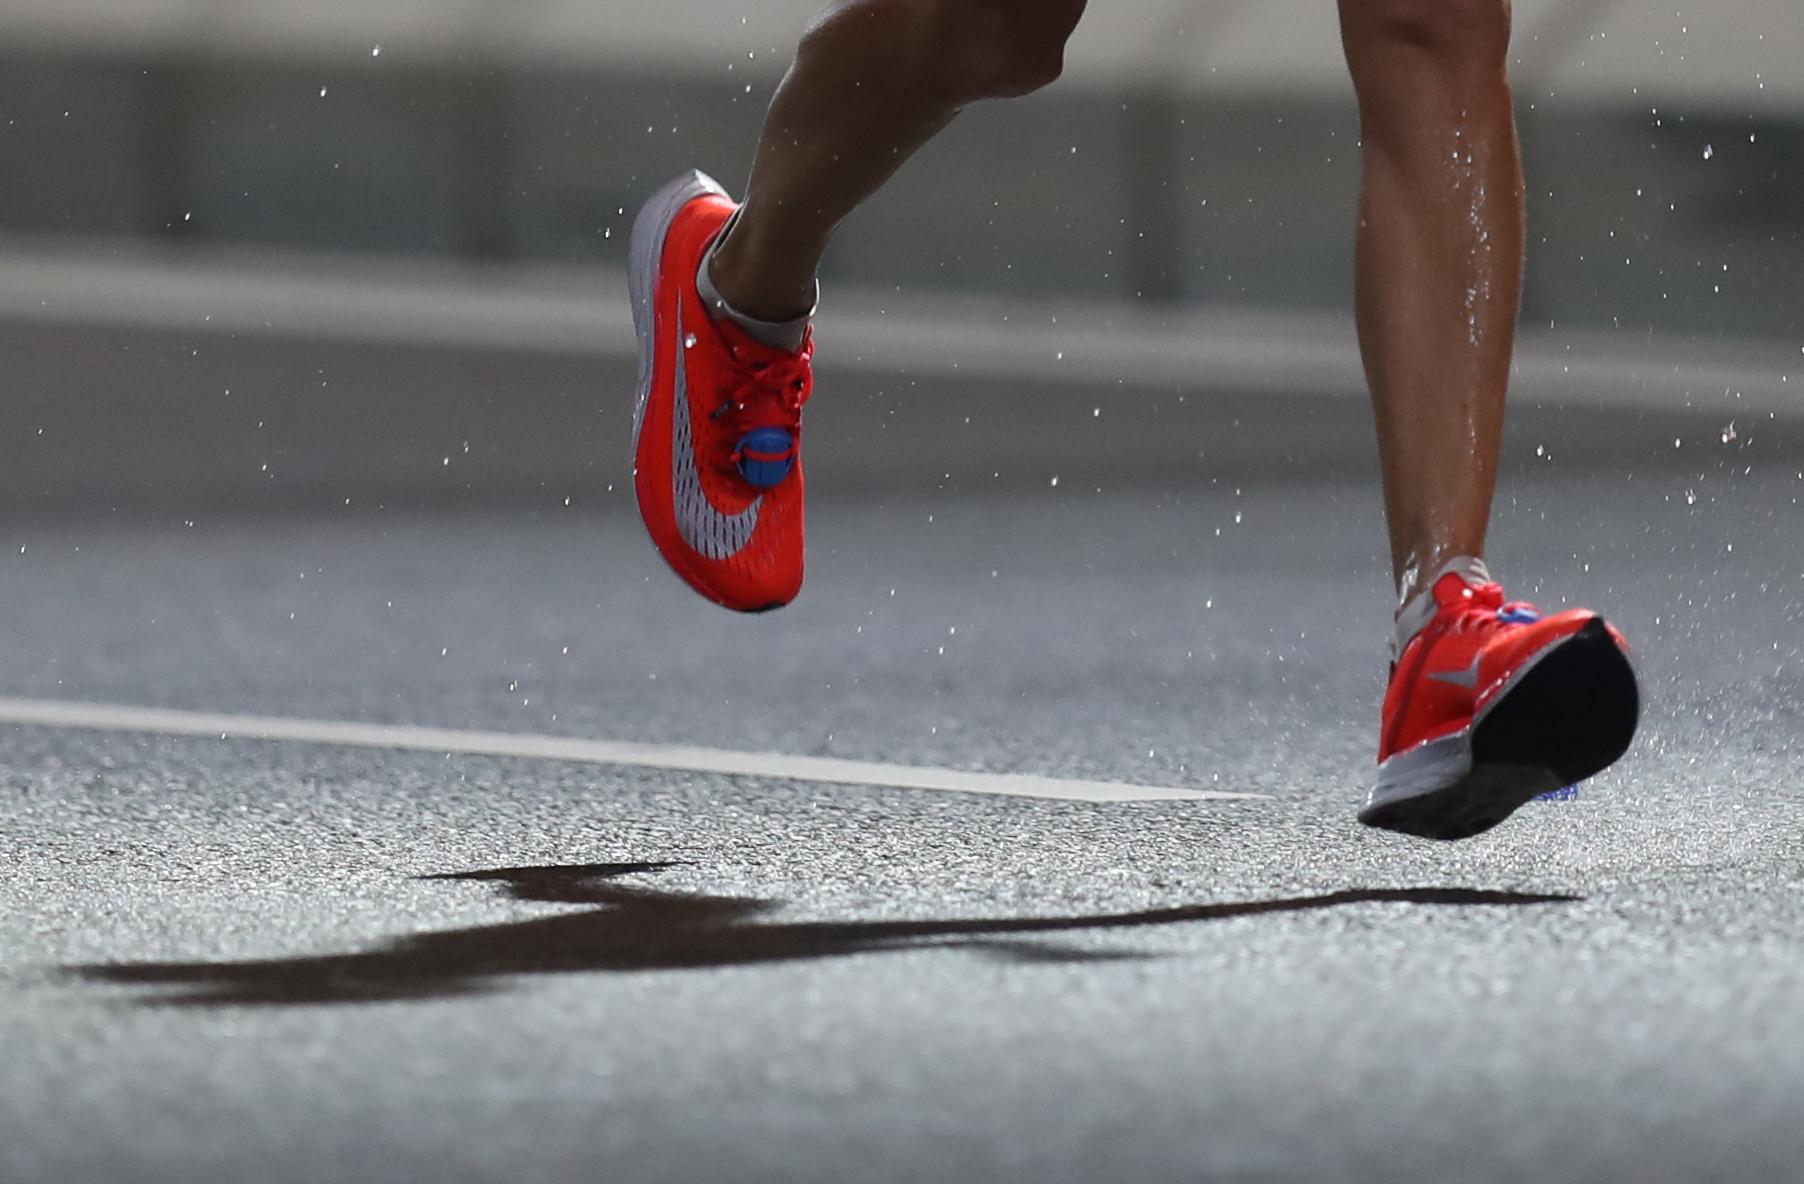 Should you buy the Nike Vaporfly 4% Flyknits? We asked a podiatrist.